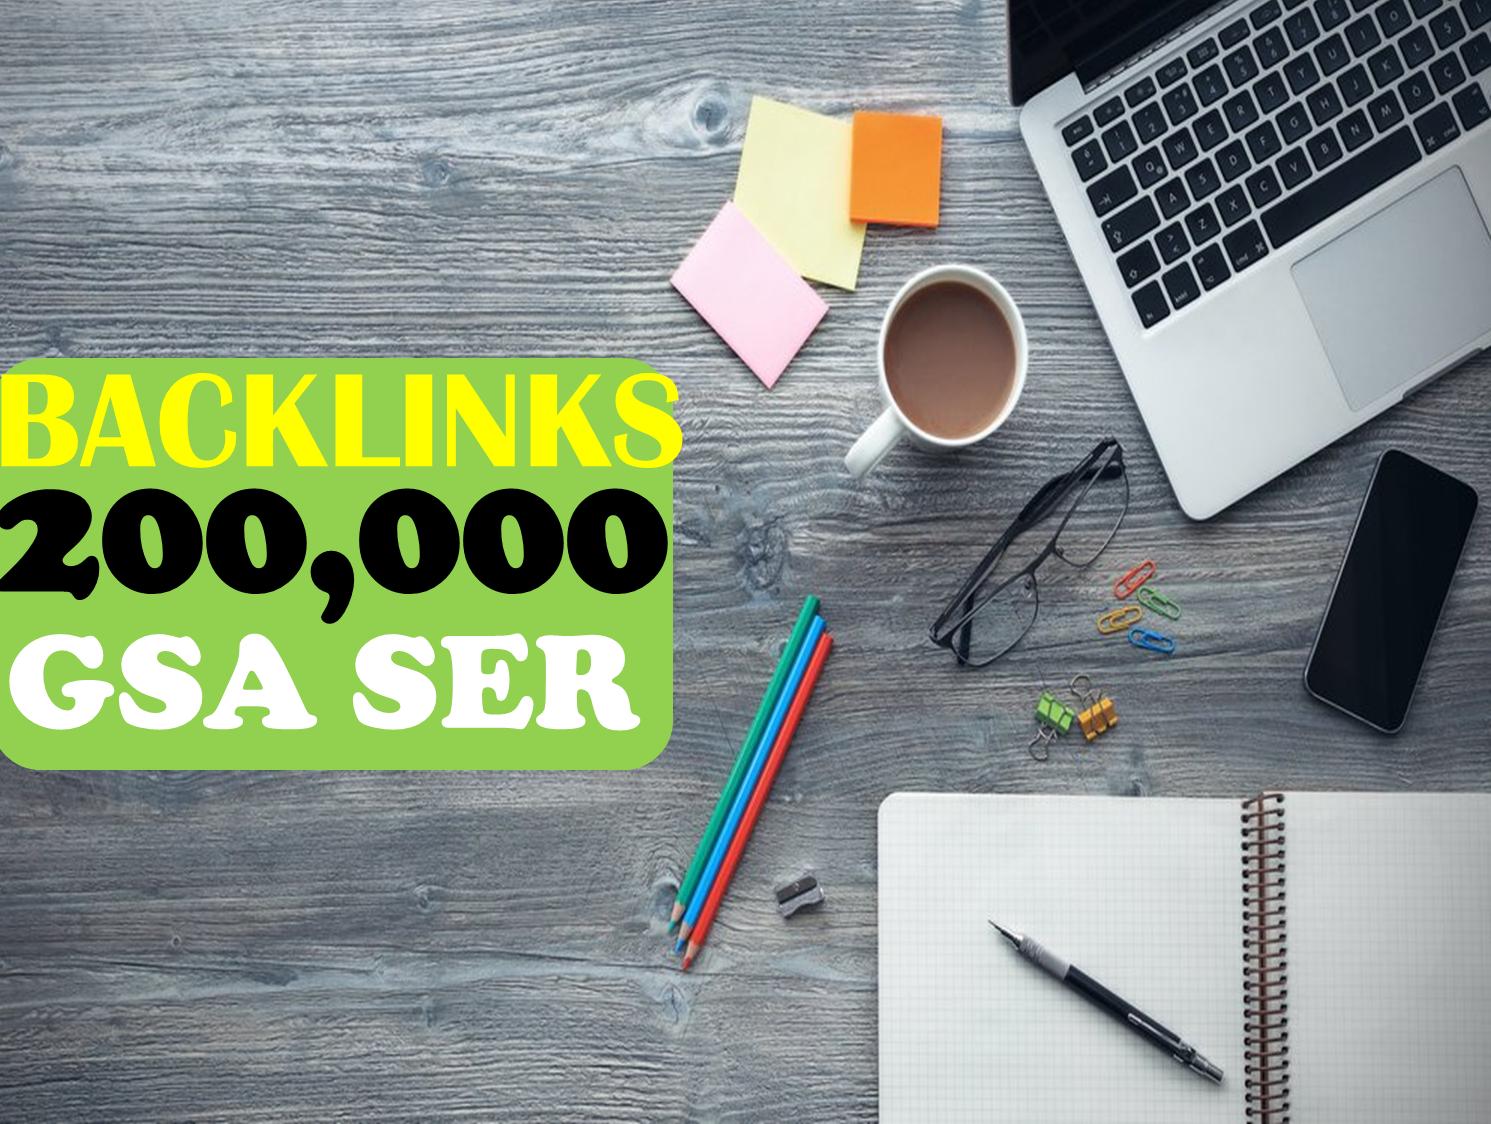 SEO SkyRocket 200,000 GSA Dofollow Links for Verified BACKLINKS Cracking Gsa Ser